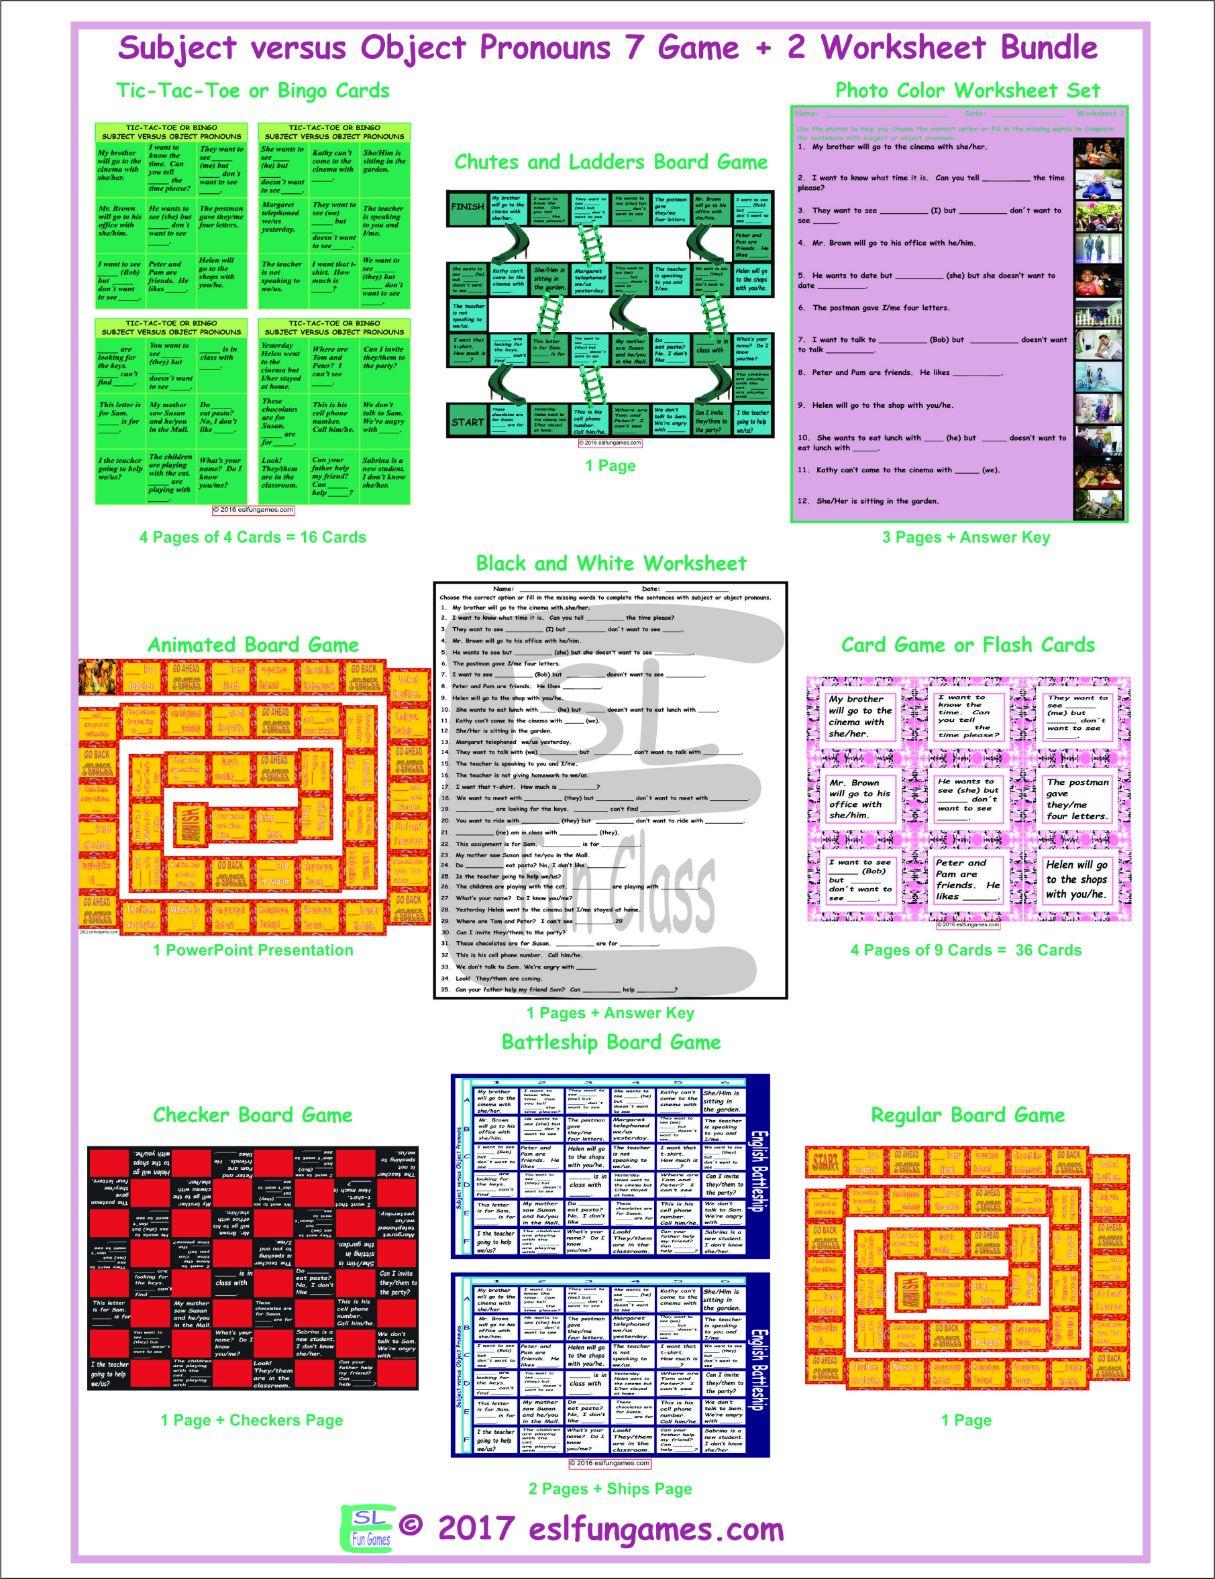 Subject versus Object Pronouns 7 Game Plus 2 Worksheet Bundle